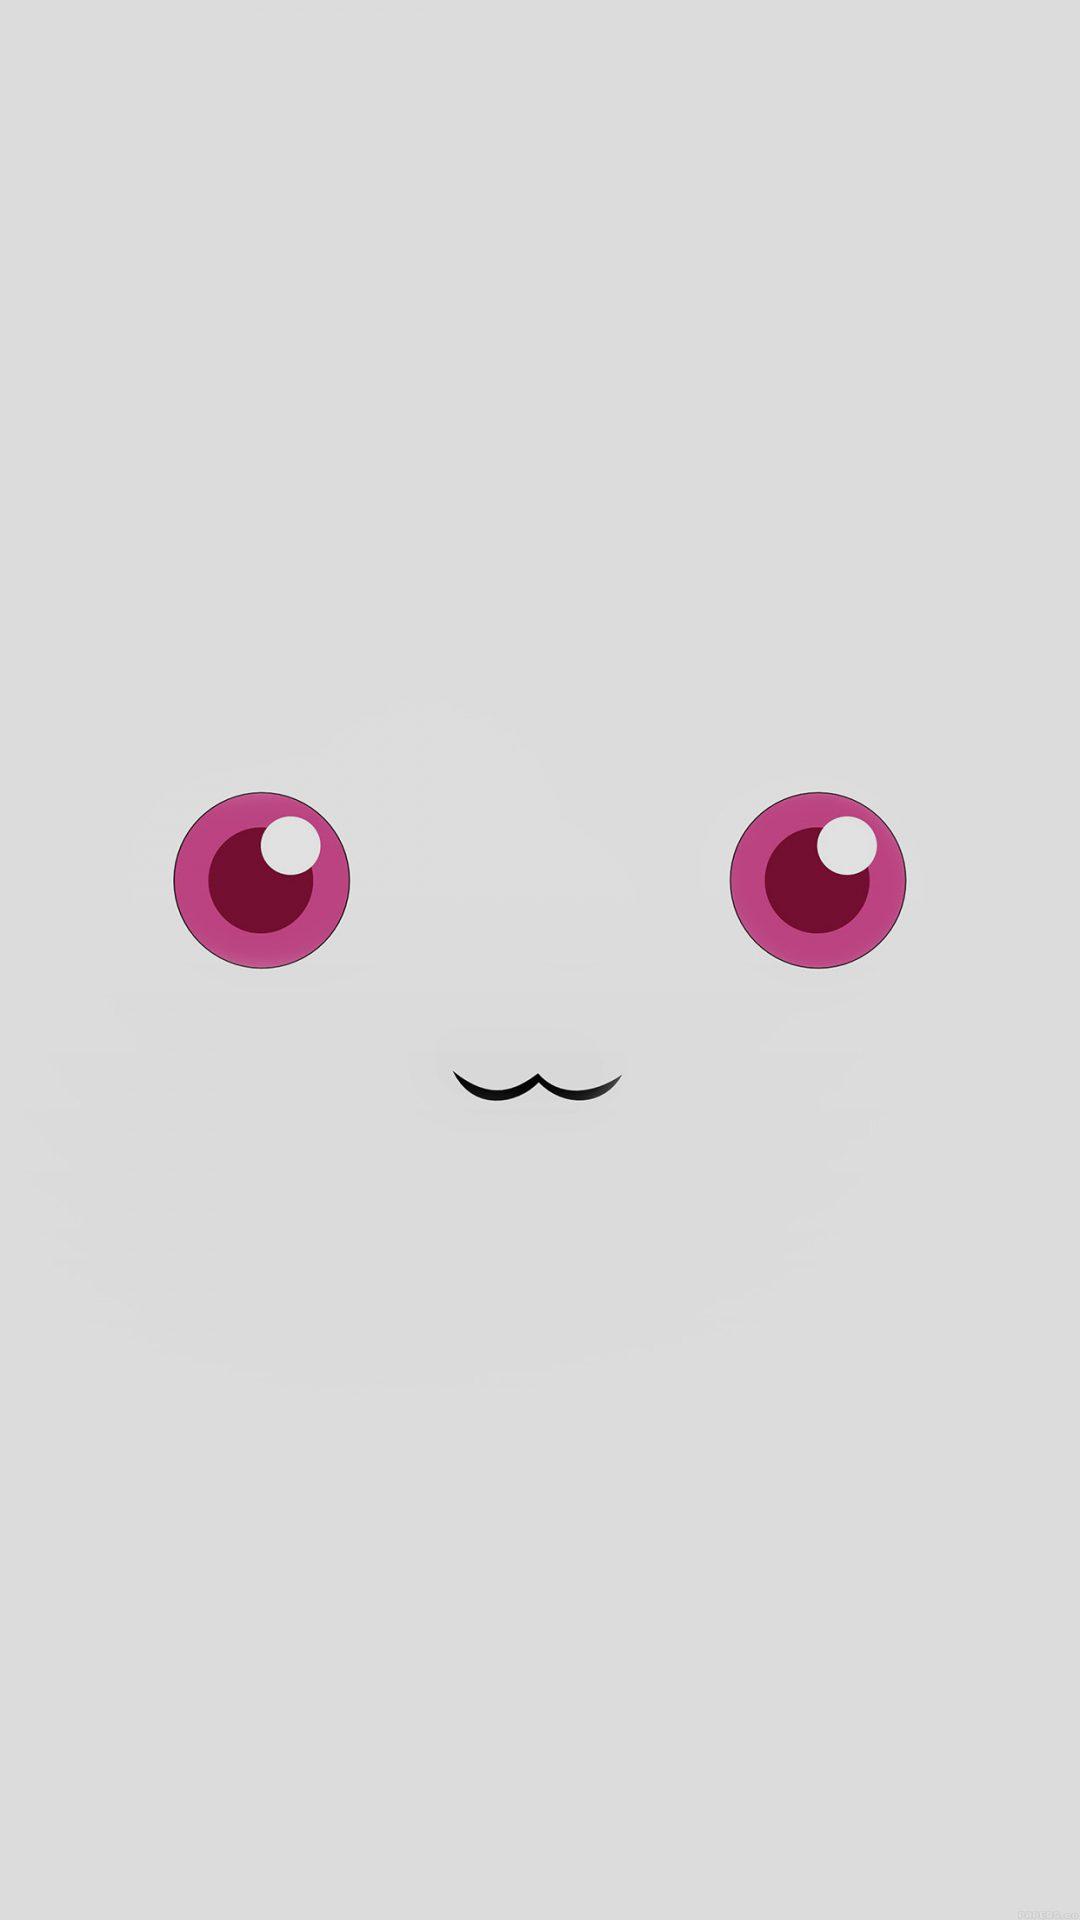 Cute Pokemon Character Anime Minimal